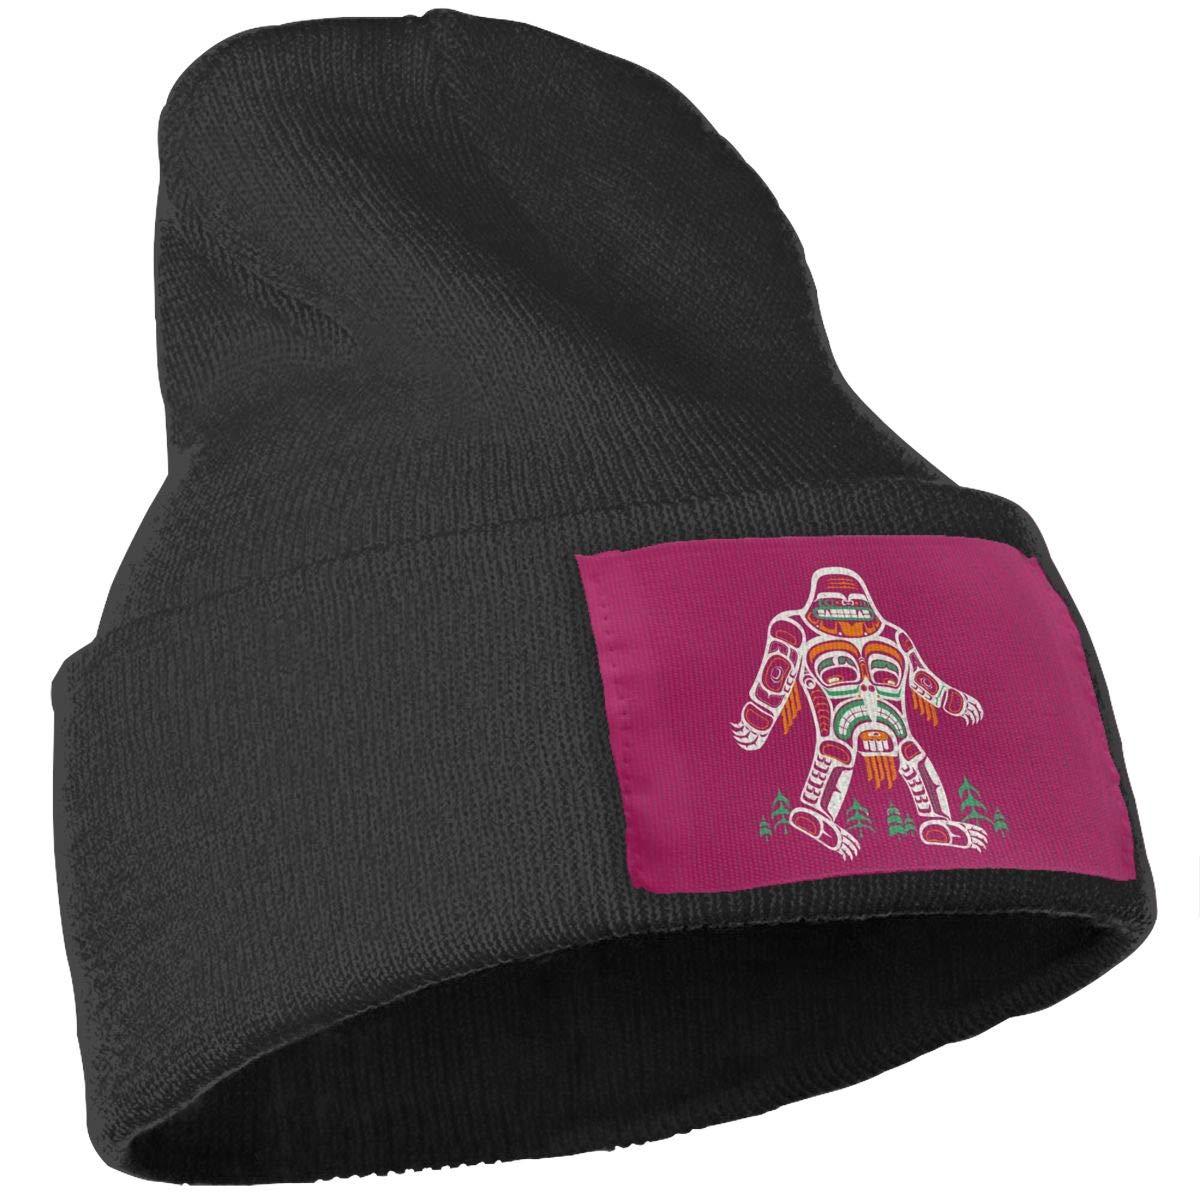 Poii Qon Tribal Bigfoot Beanies Hats Wool Knit Caps for Women Men